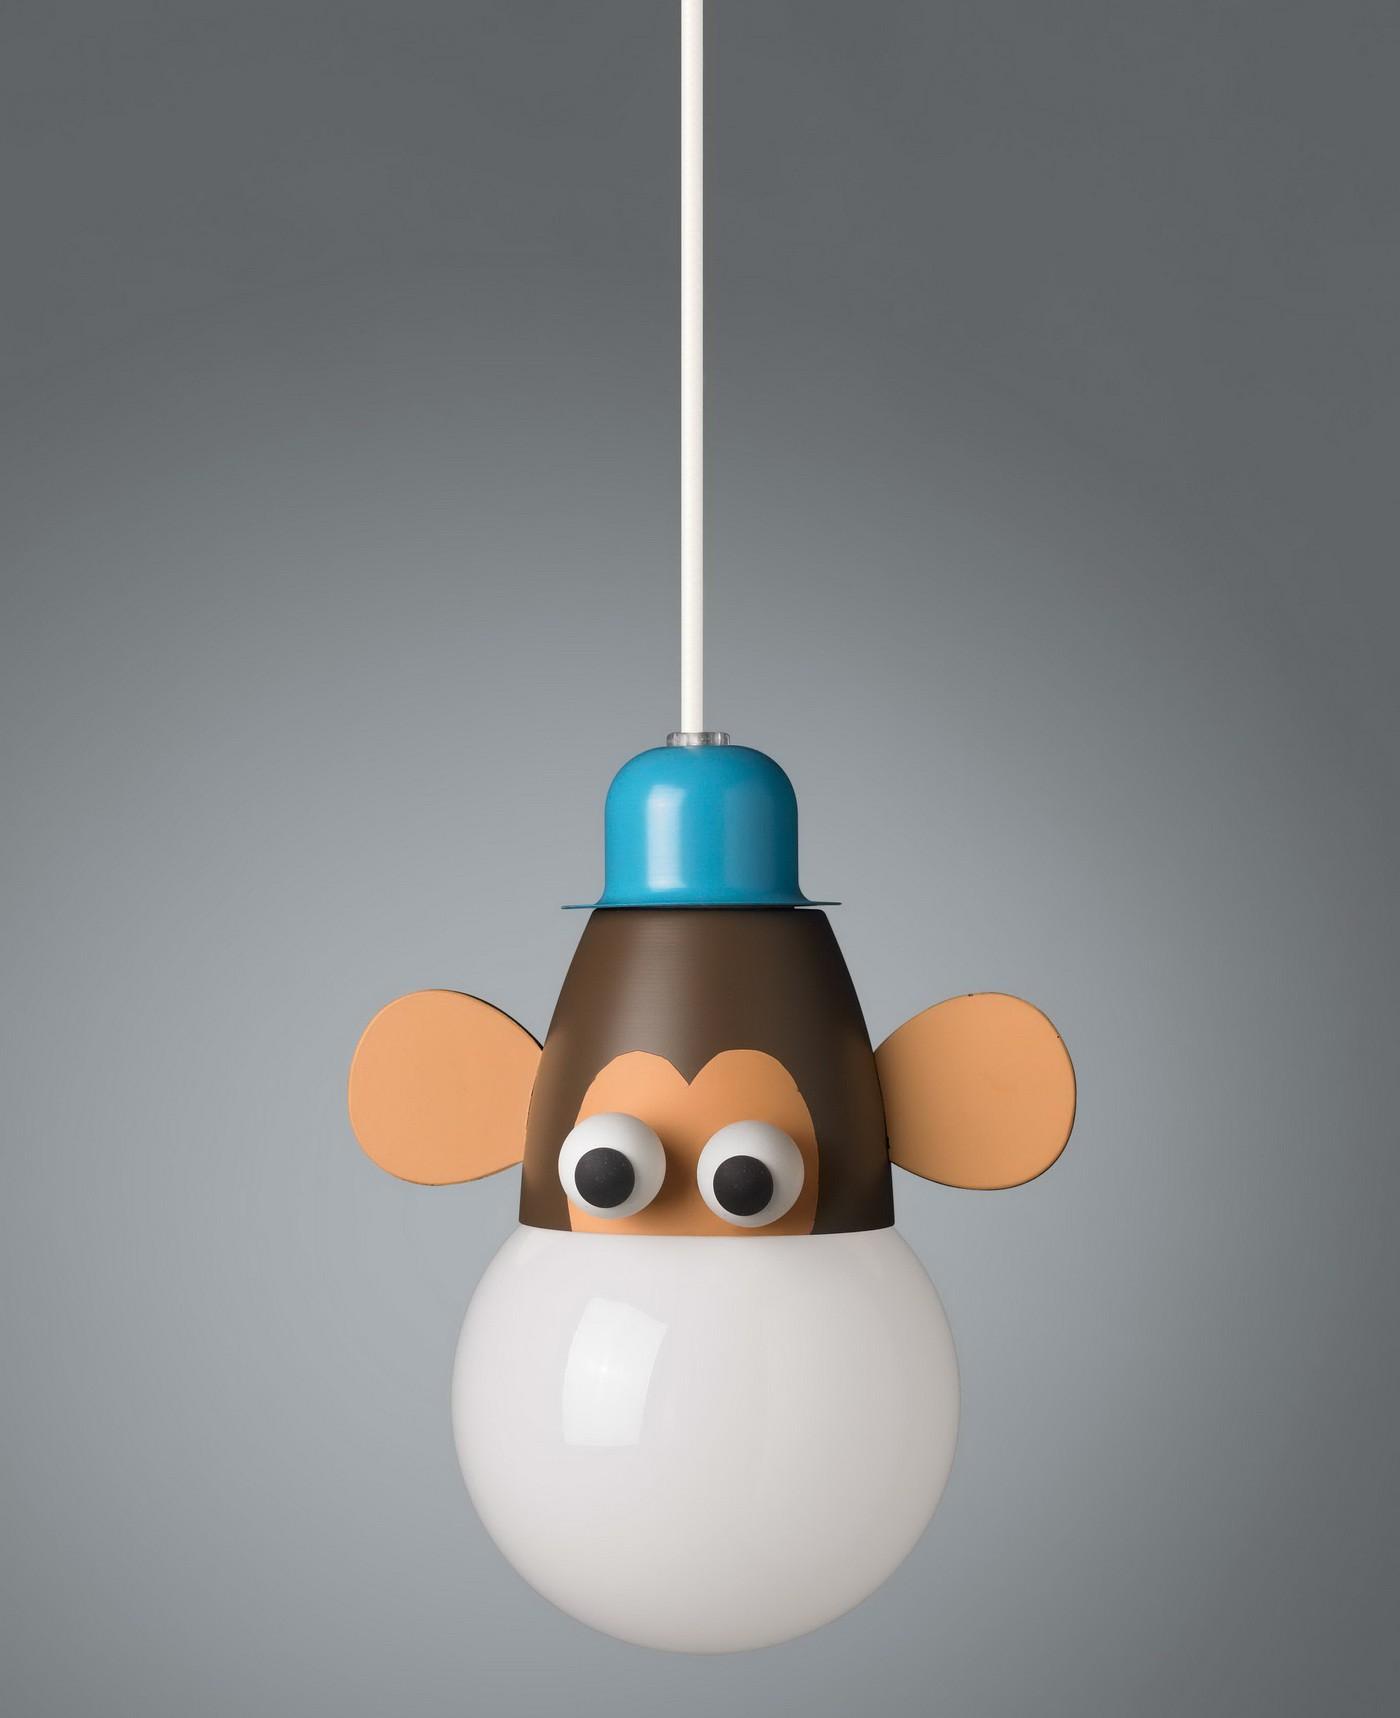 Kinderzimmerlampe Kiko Monkey Pendelleuchte Energiespar Pendel